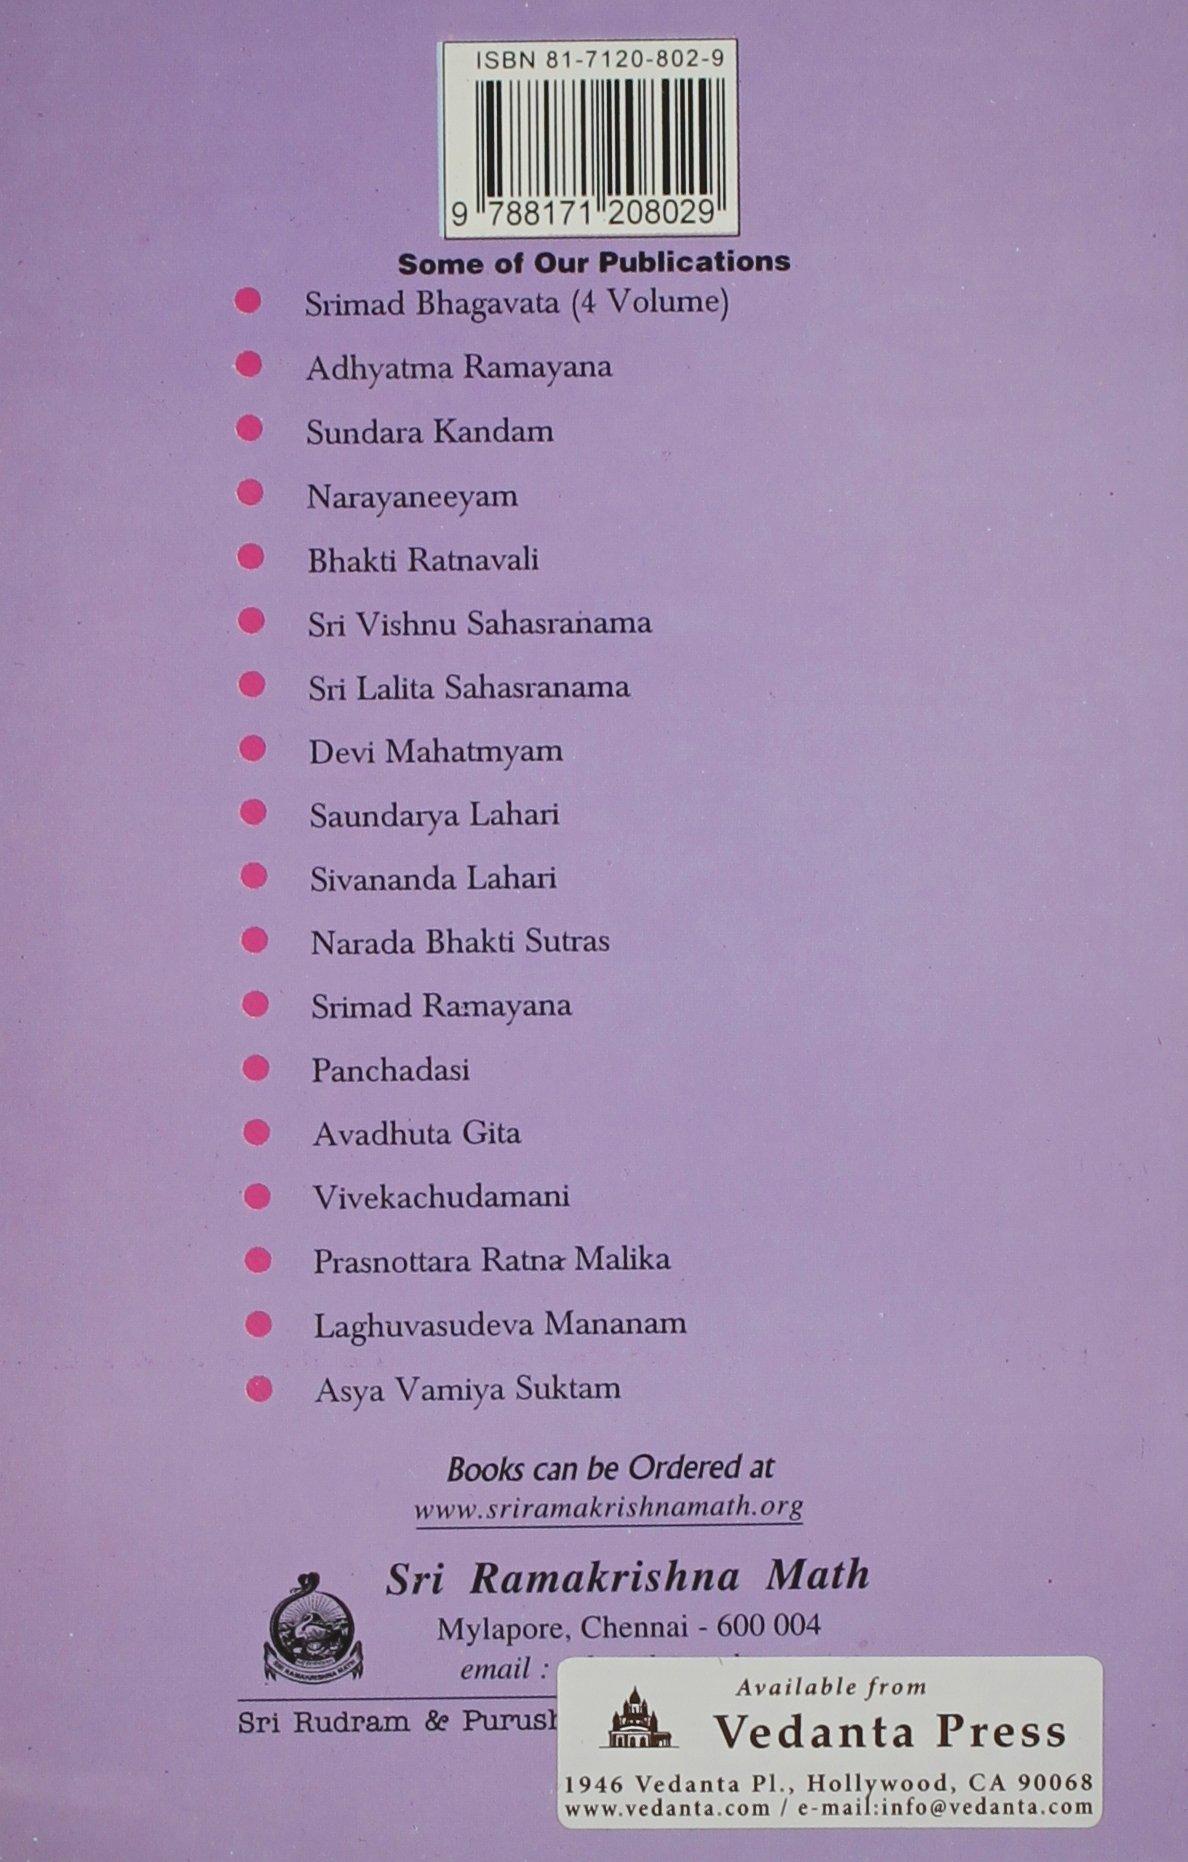 Buy sri rudram purushasuktam book online at low prices in india buy sri rudram purushasuktam book online at low prices in india sri rudram purushasuktam reviews ratings amazon fandeluxe Images